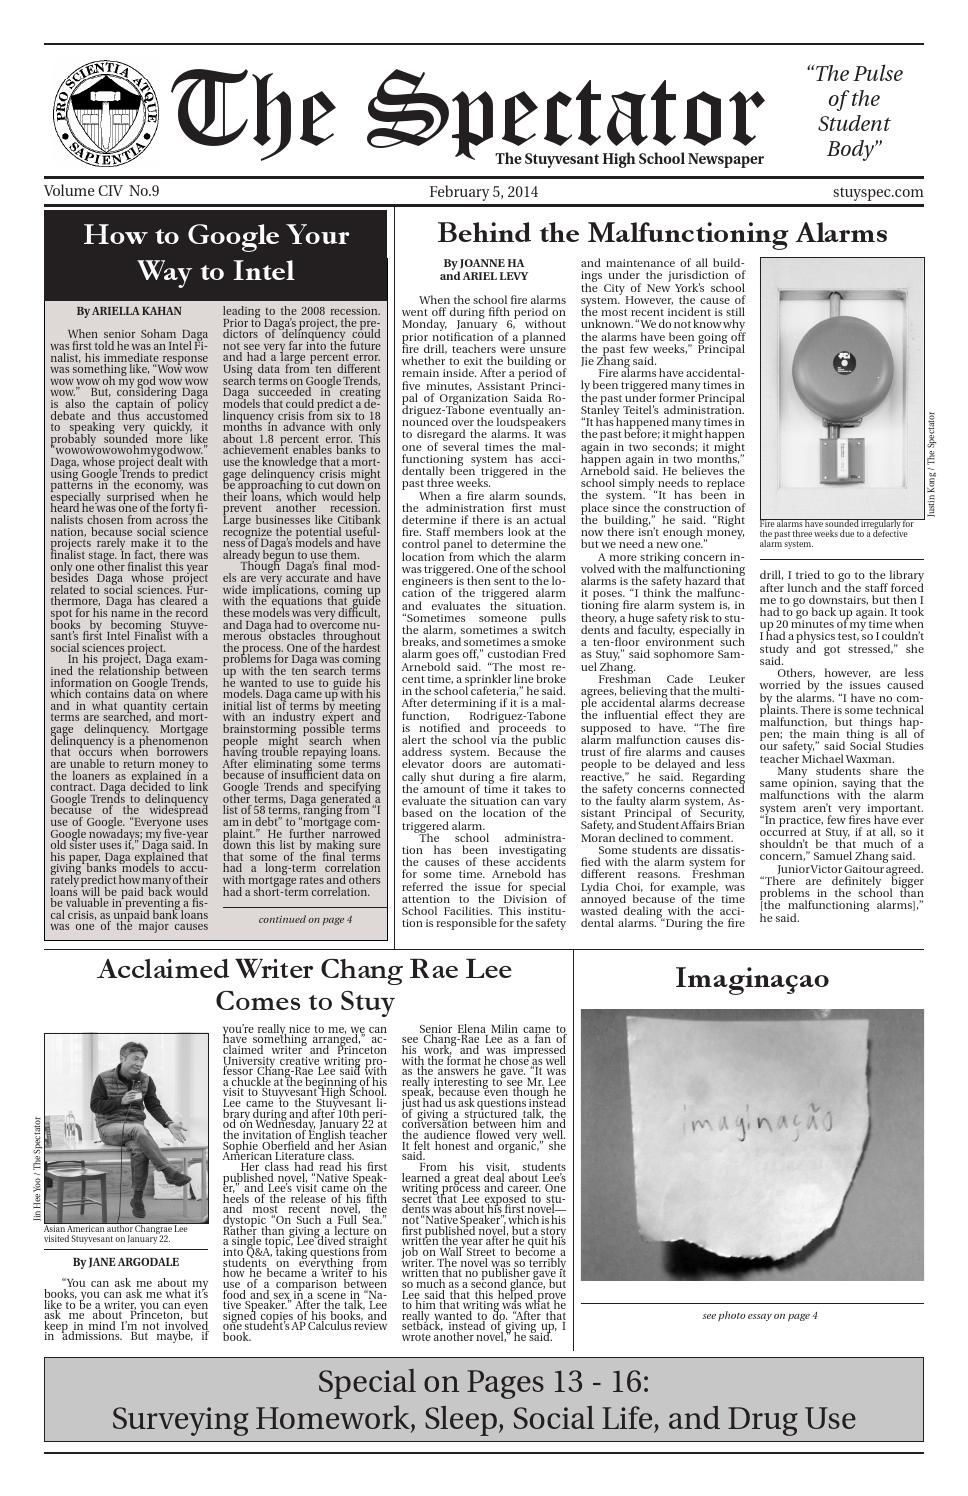 Volume 104 Issue 9 by The Stuyvesant Spectator issuu